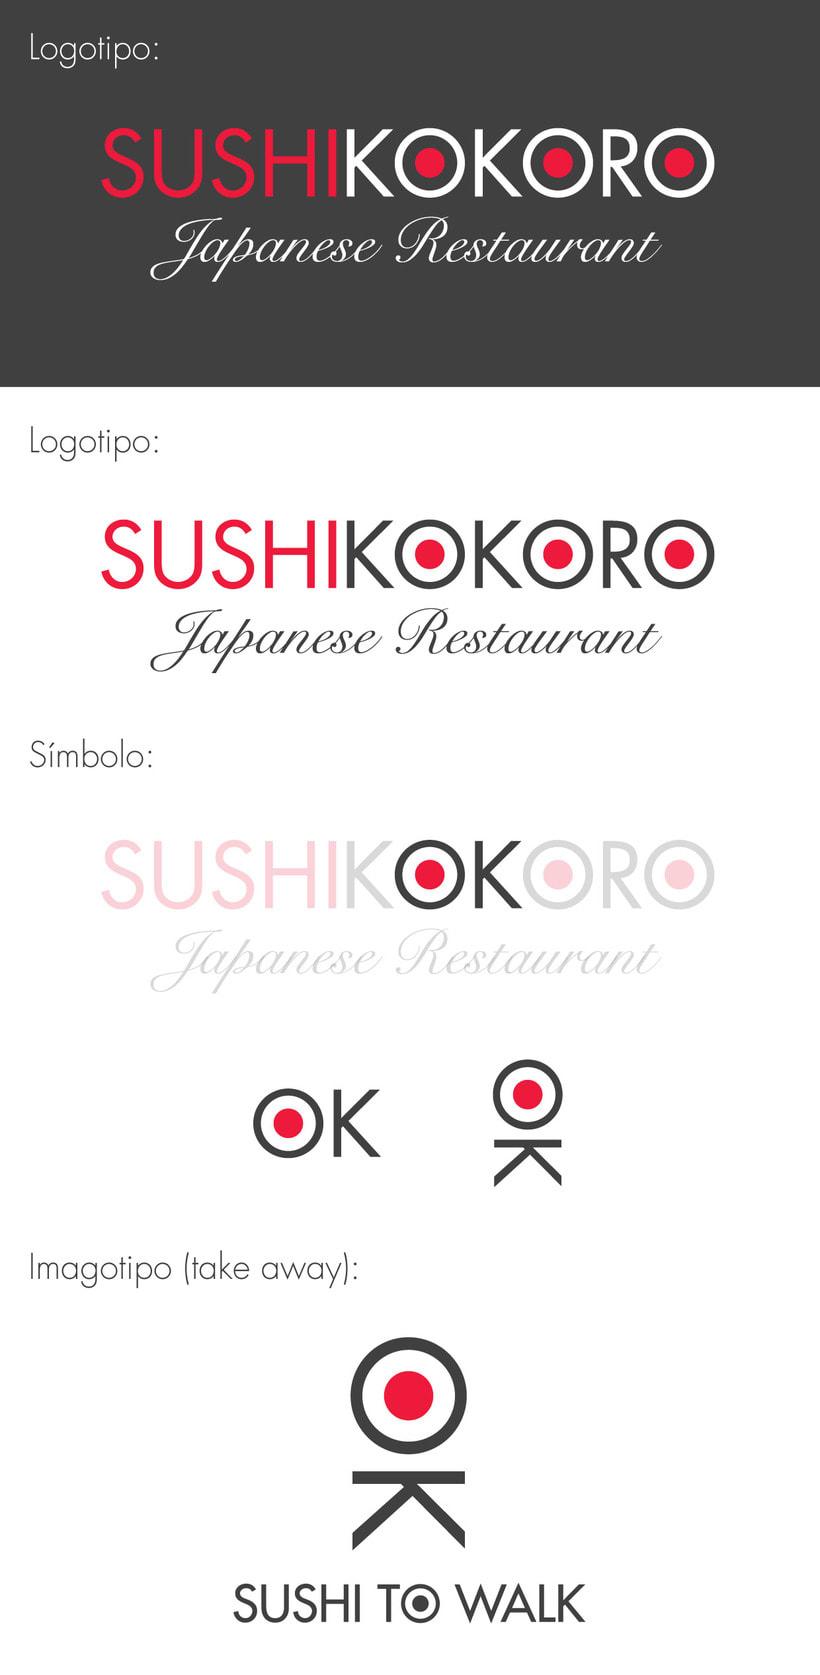 Visual Identity - ShushiKokoro 1